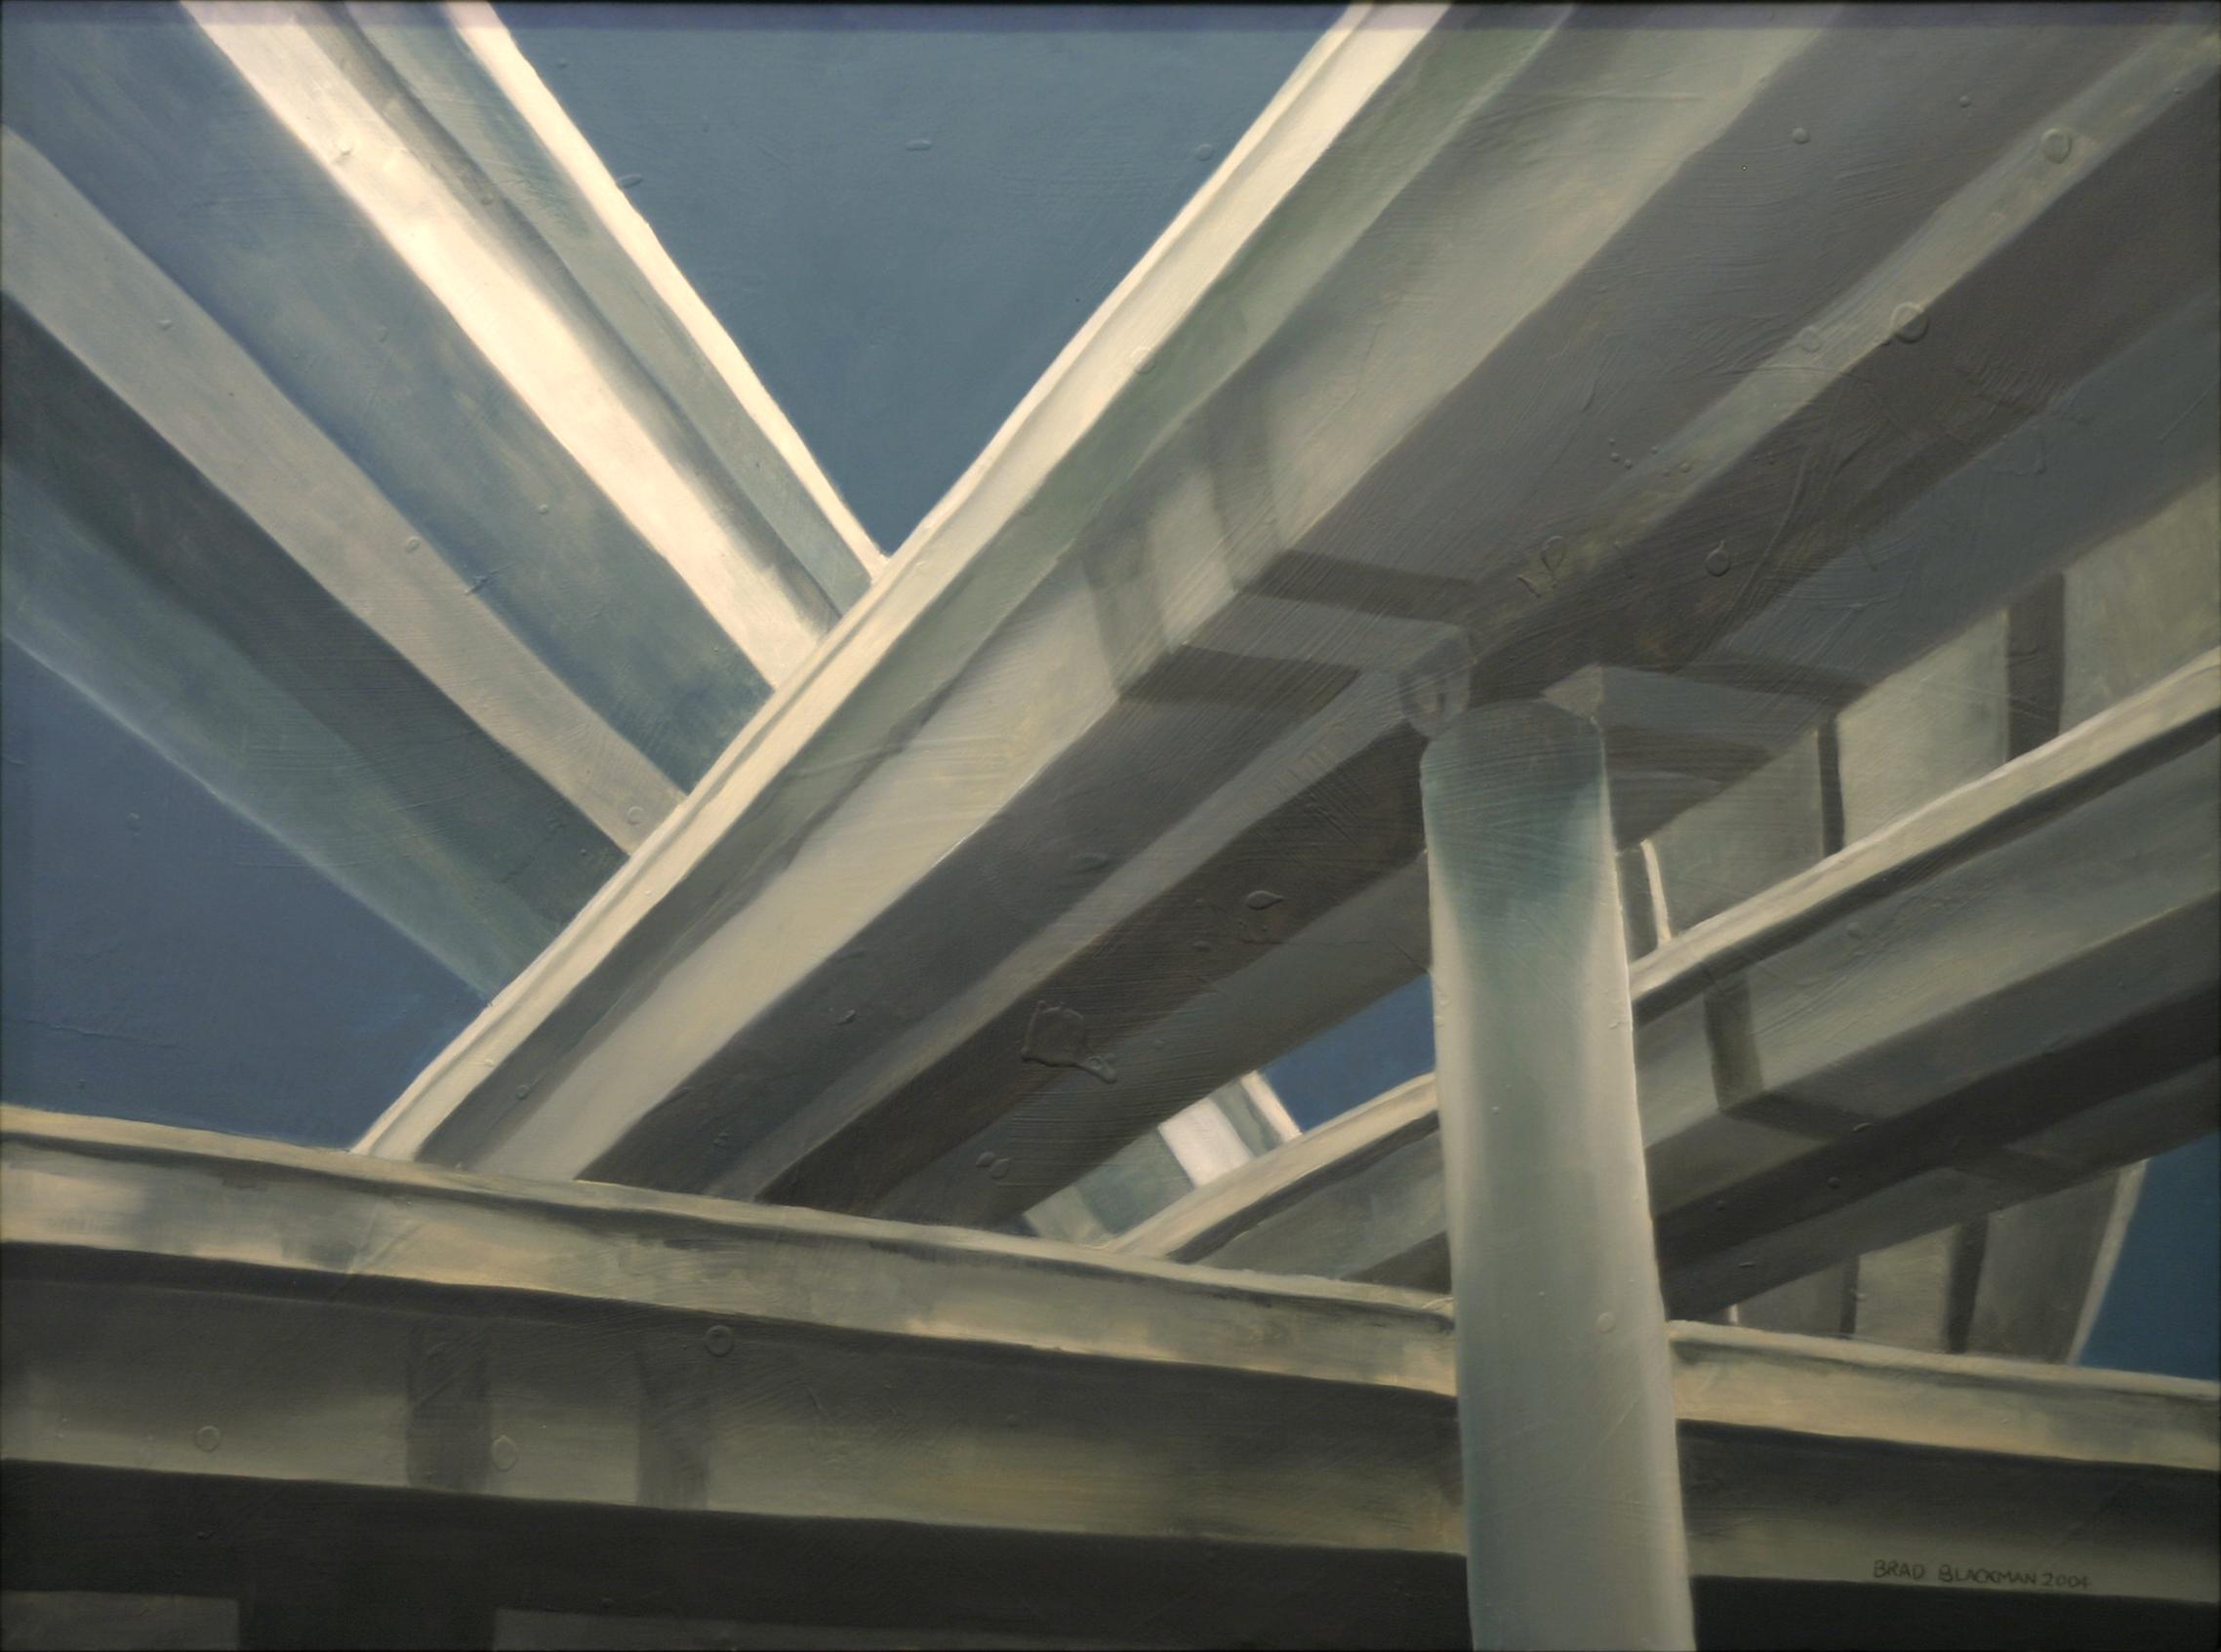 Brad Blackman, Interchange, 2004. oil on canvas, 30 x 40 inches